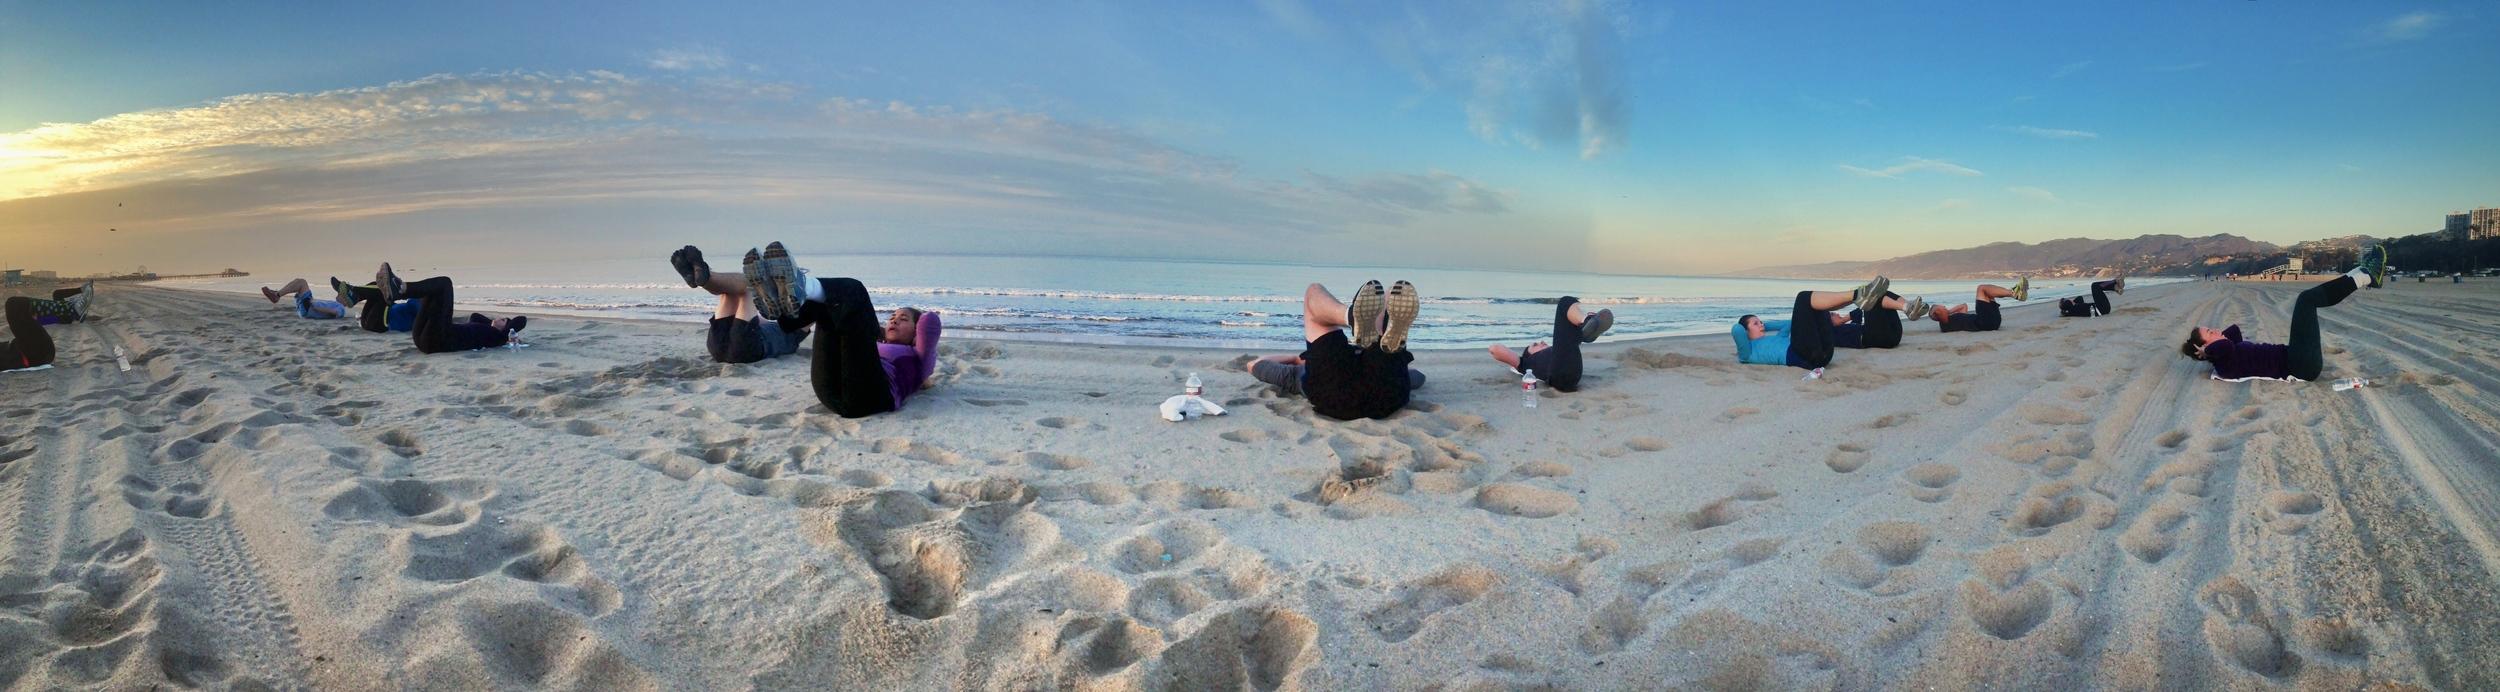 beach cardio core workout build muscle.JPG